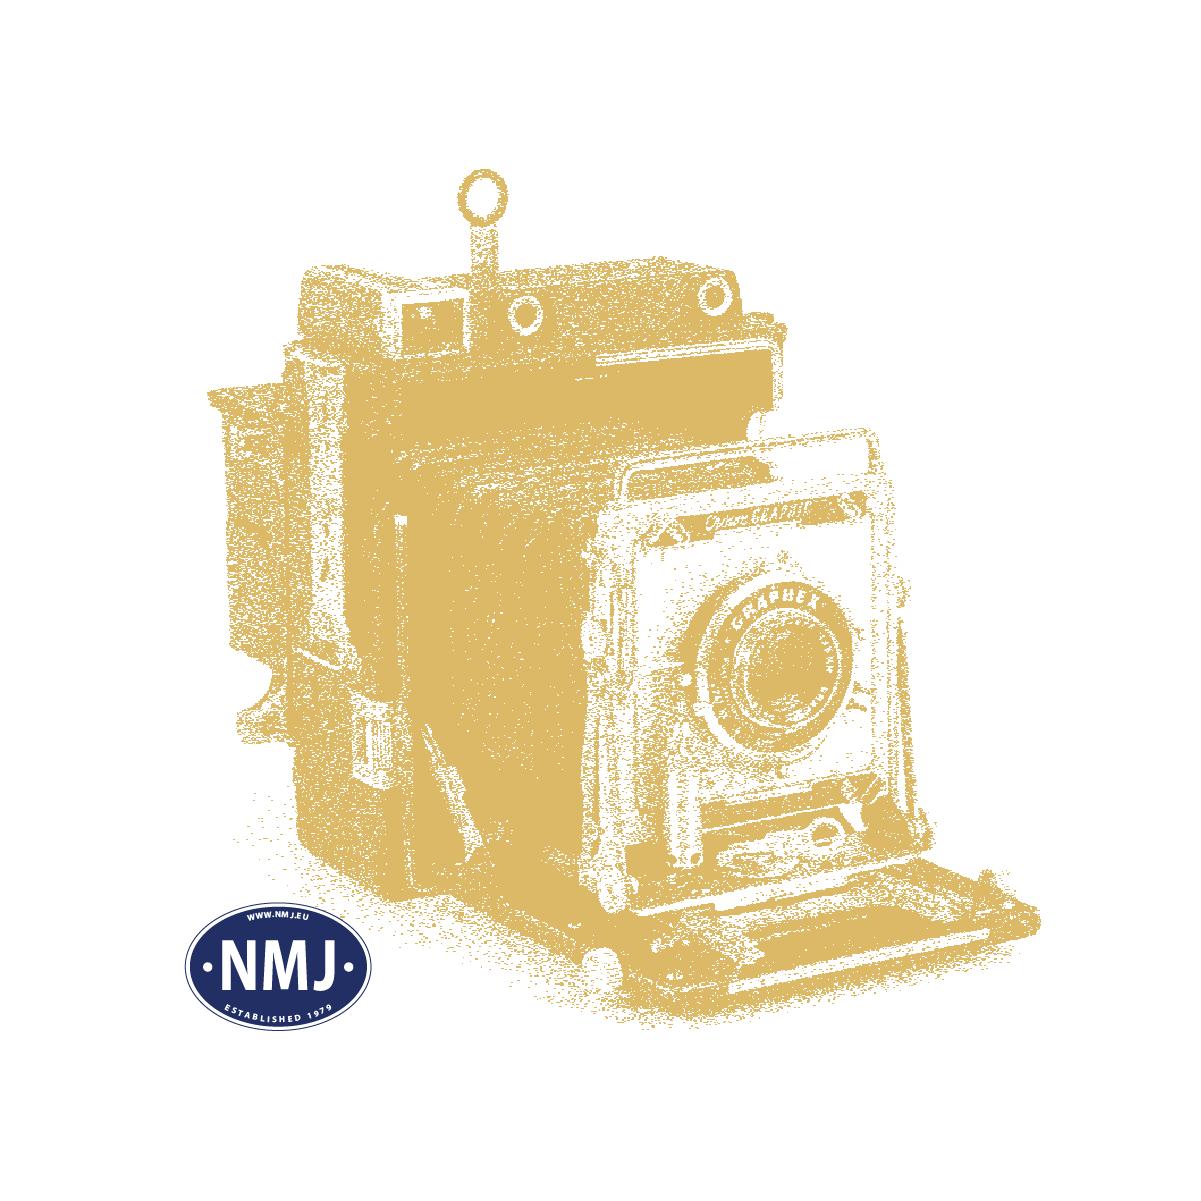 NMJT90203 - NMJ Topline MAV M61.006, DCC Sound